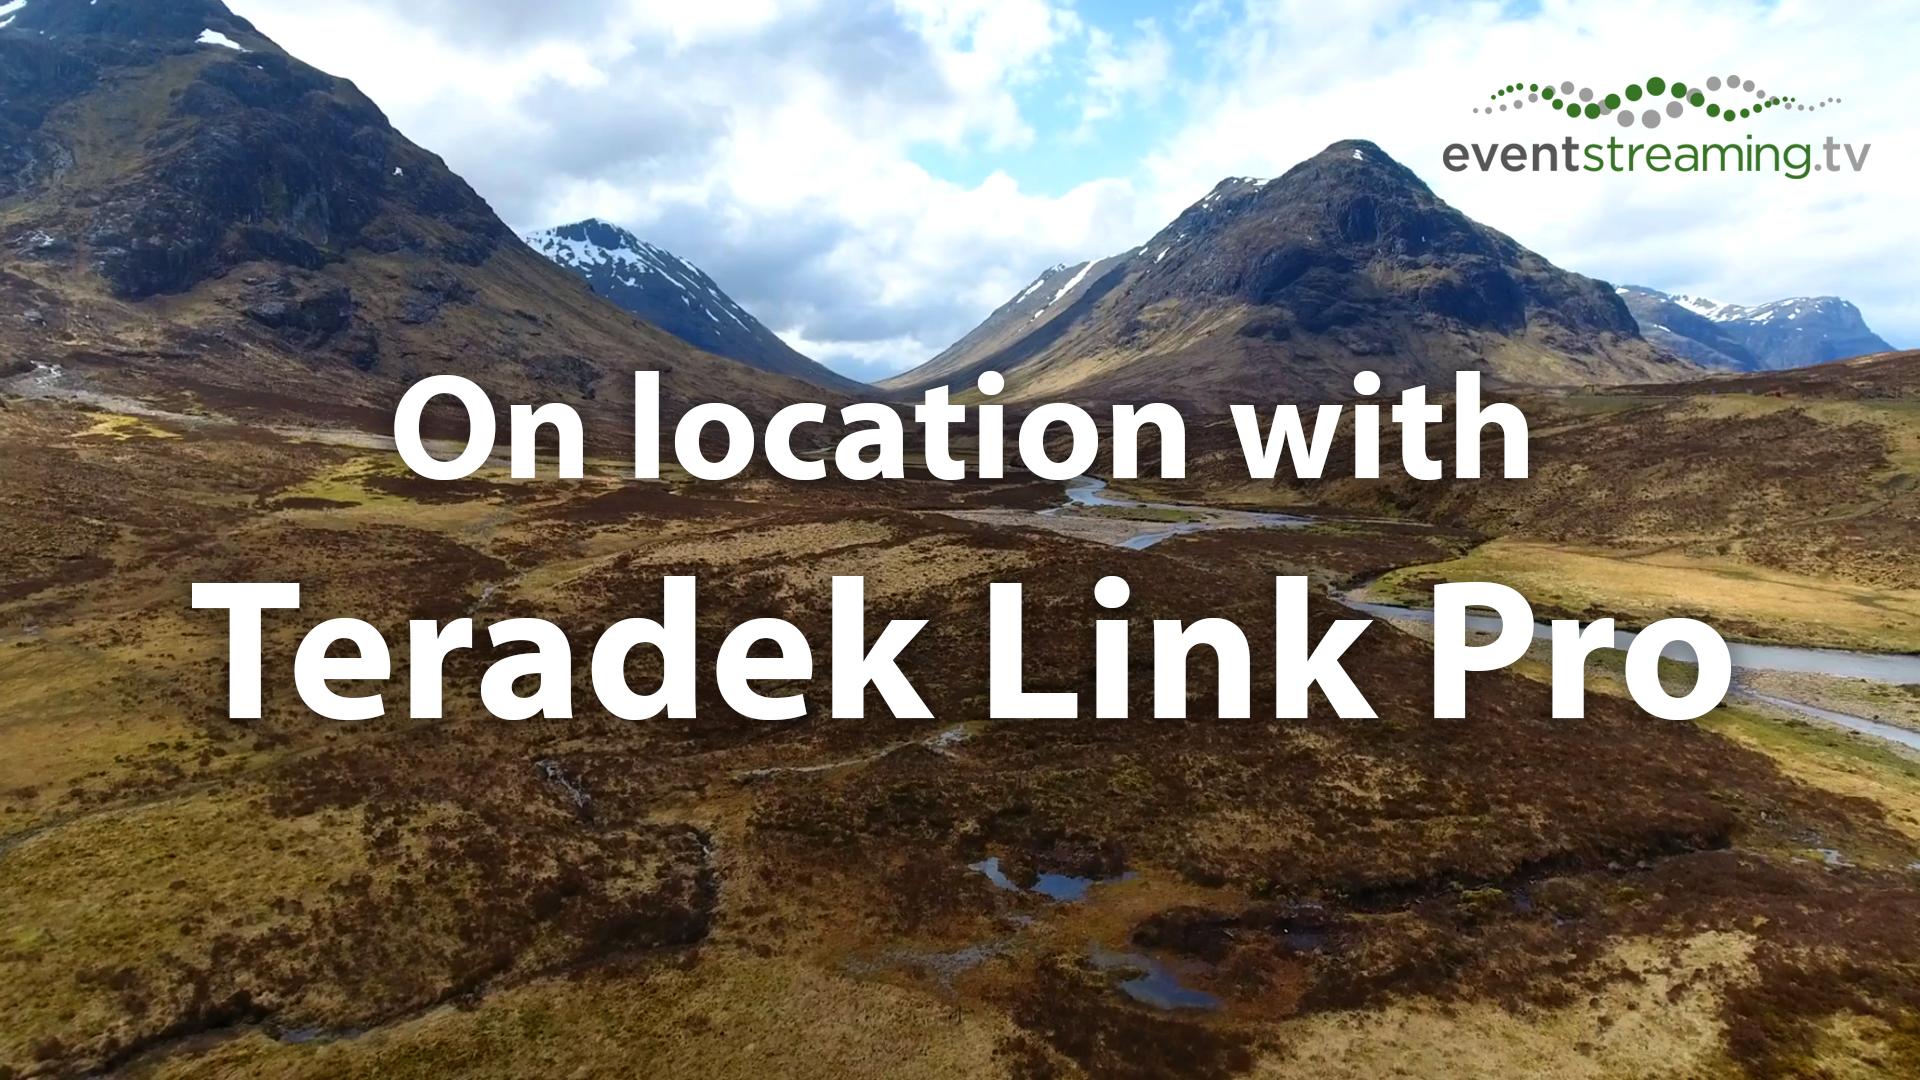 portable WiFi Teradek link pro hire remote wifi rent teradek remote event streaming tv